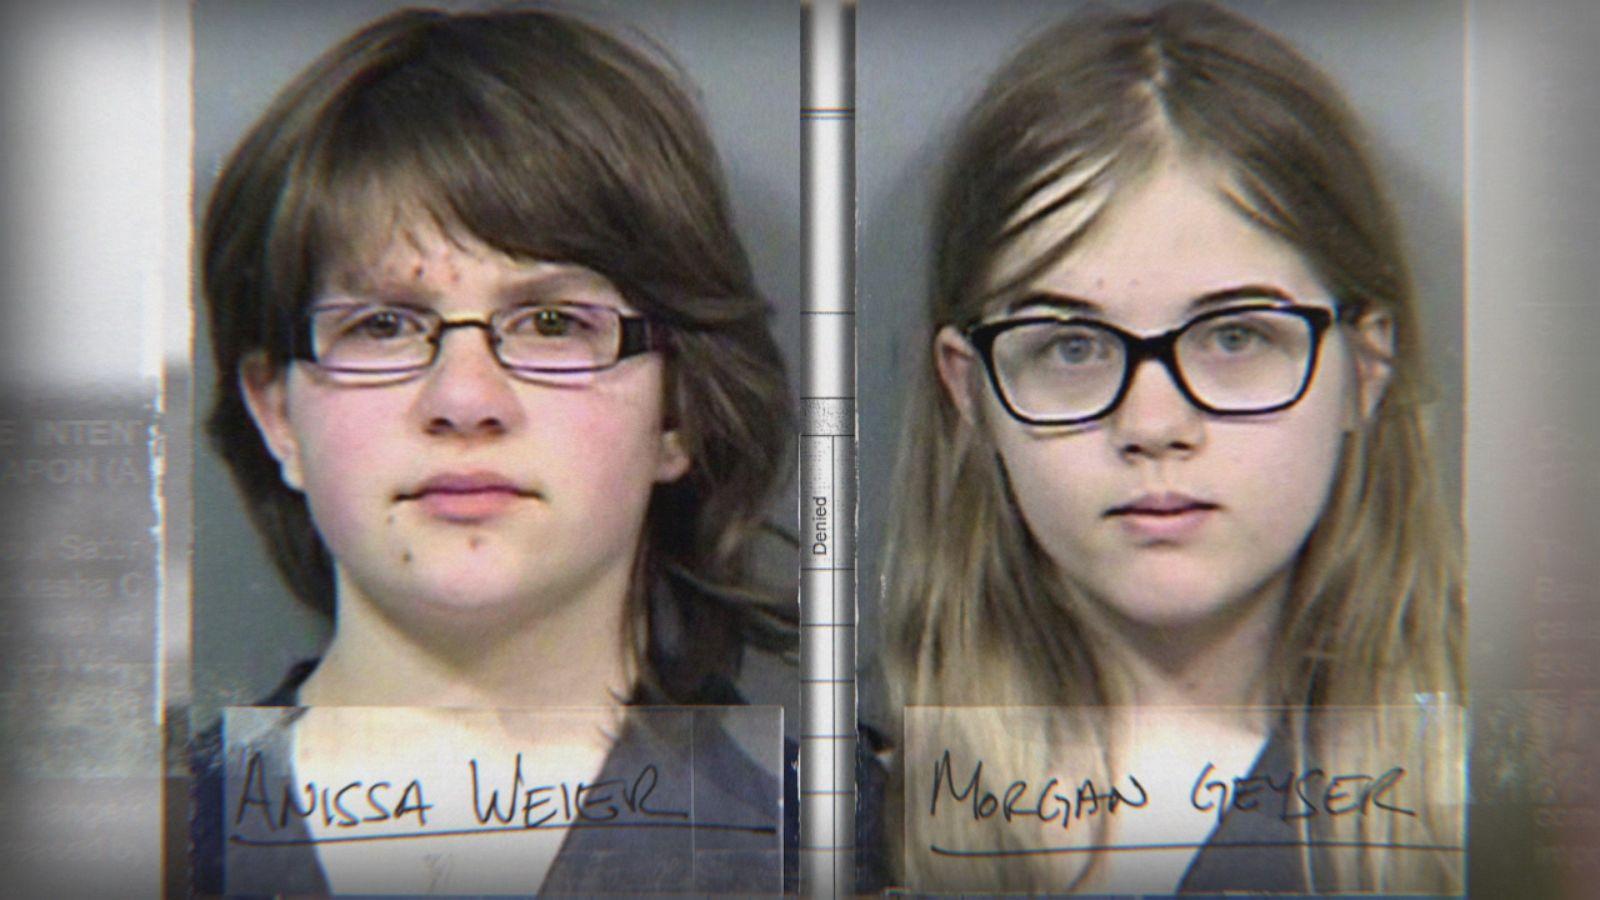 Morgan Geyser dan Anissa Weier 12 tahun